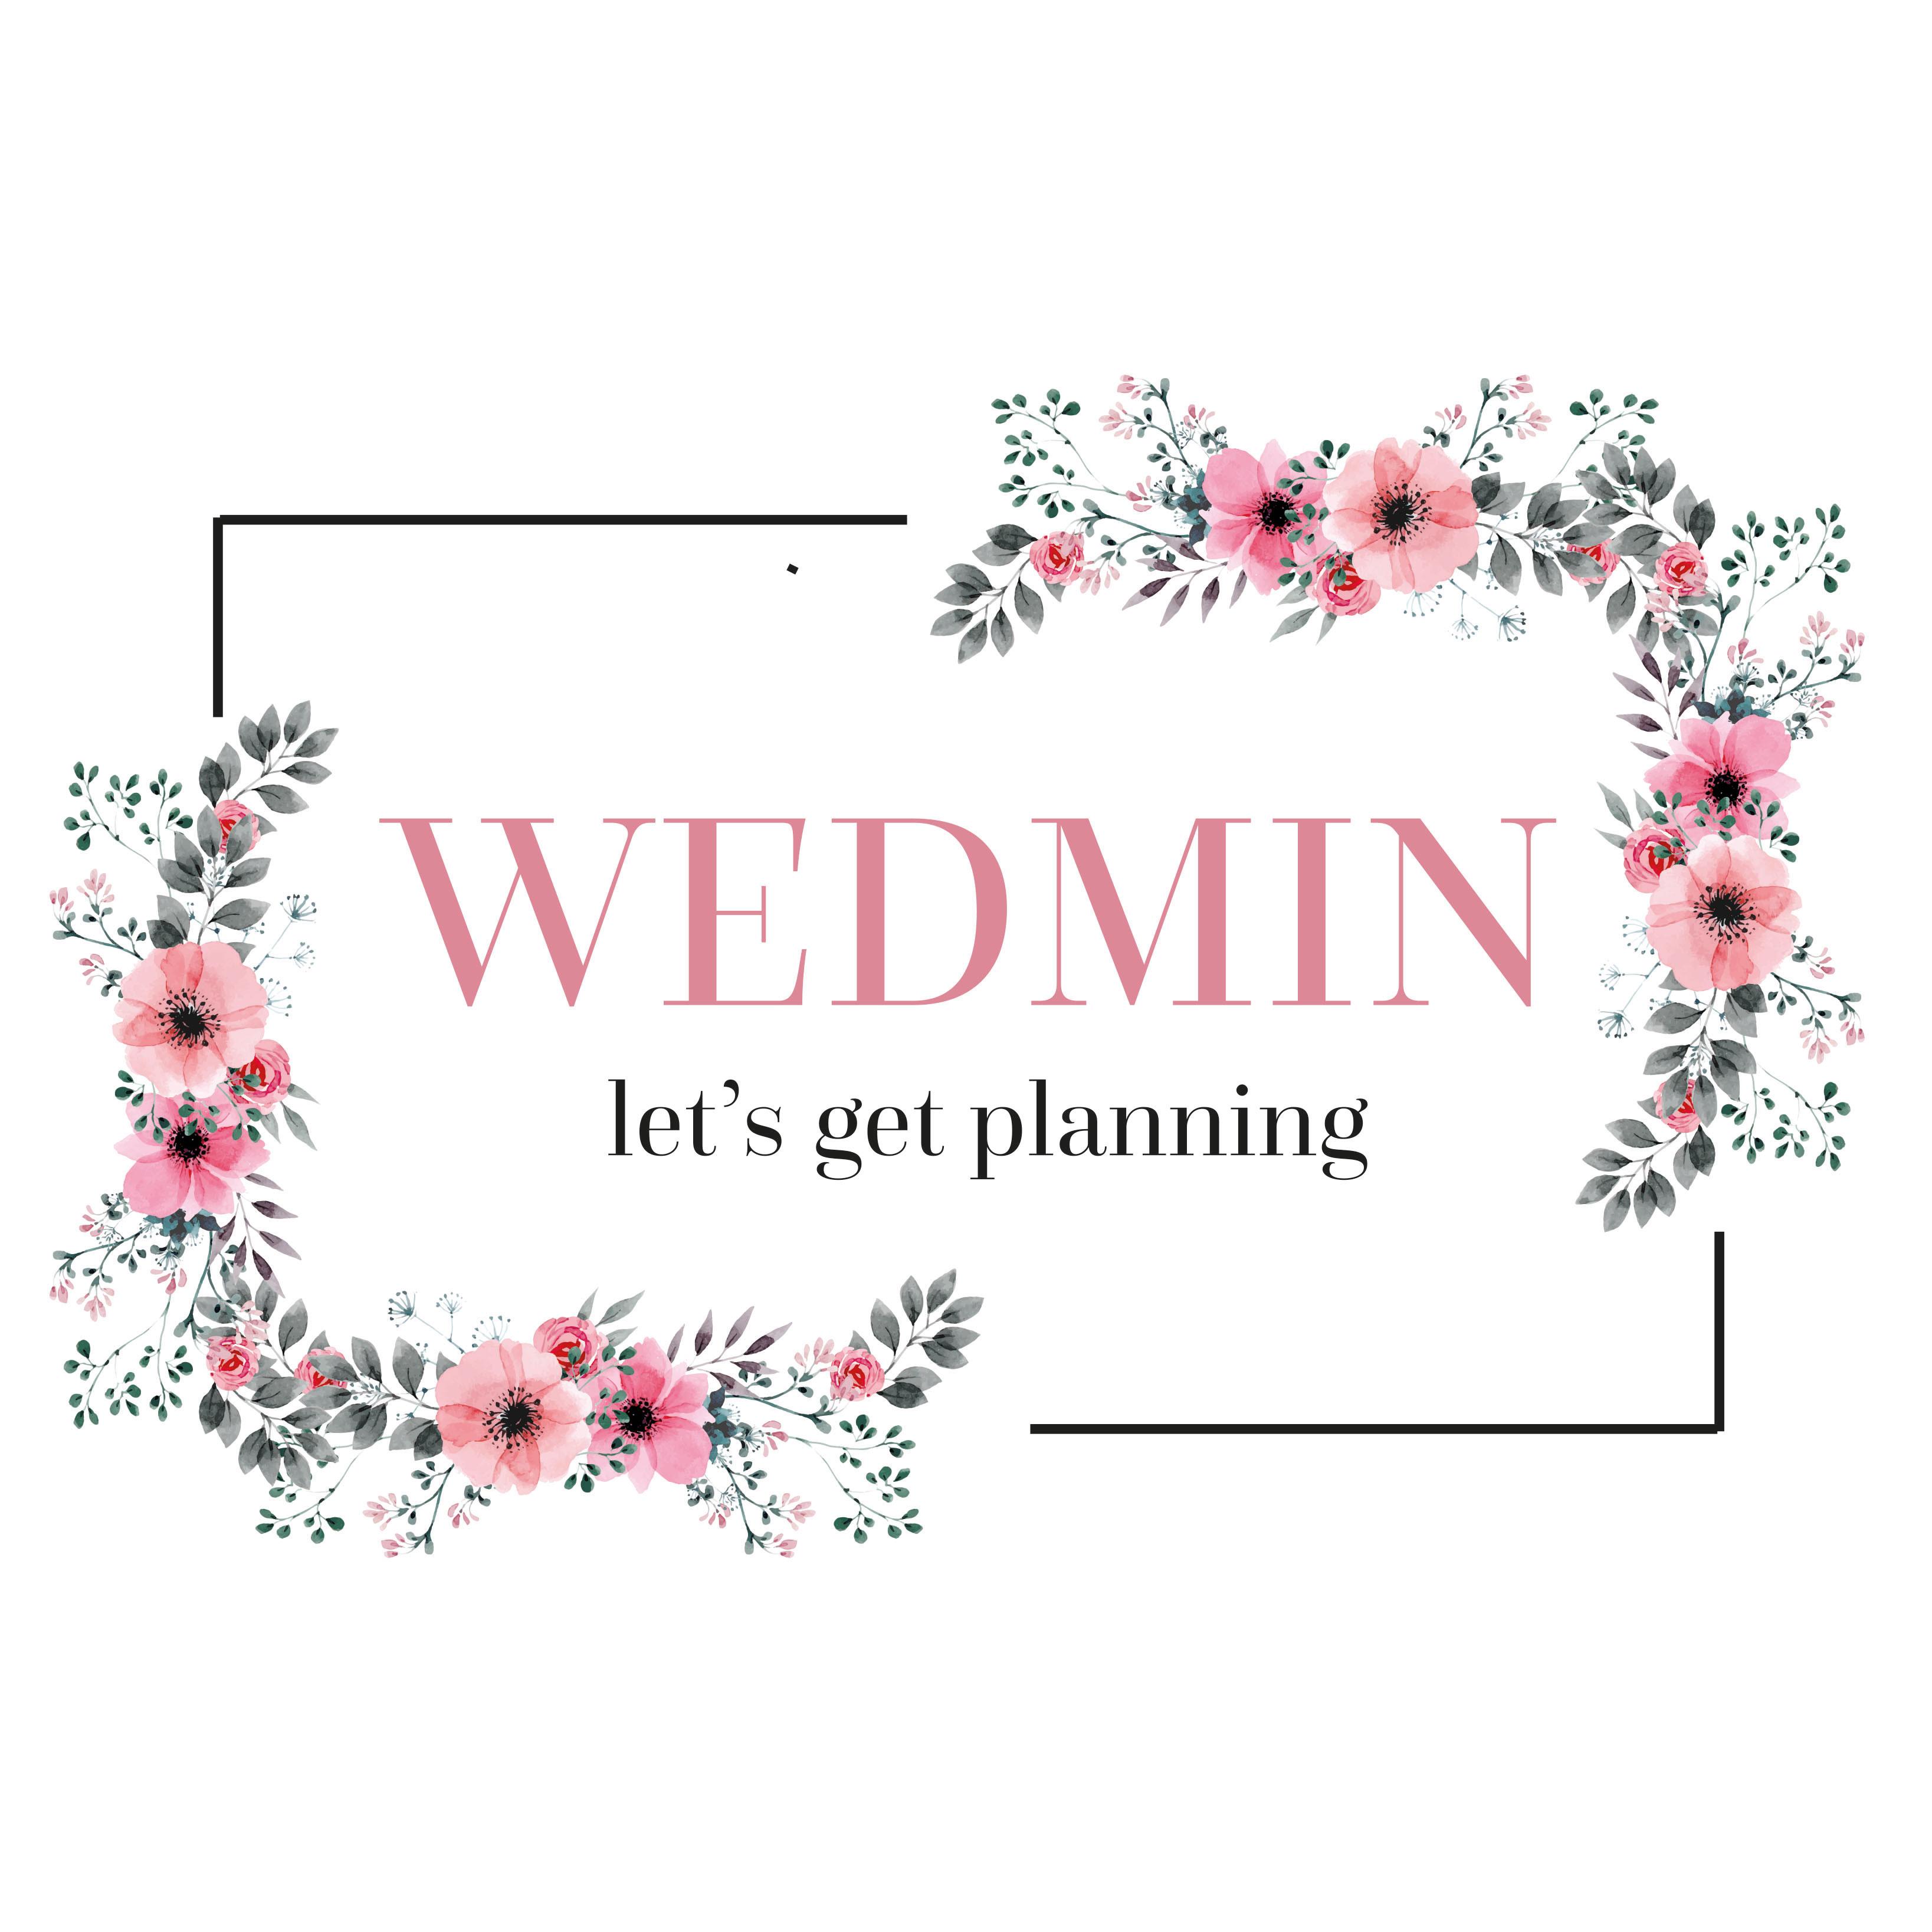 wedmin